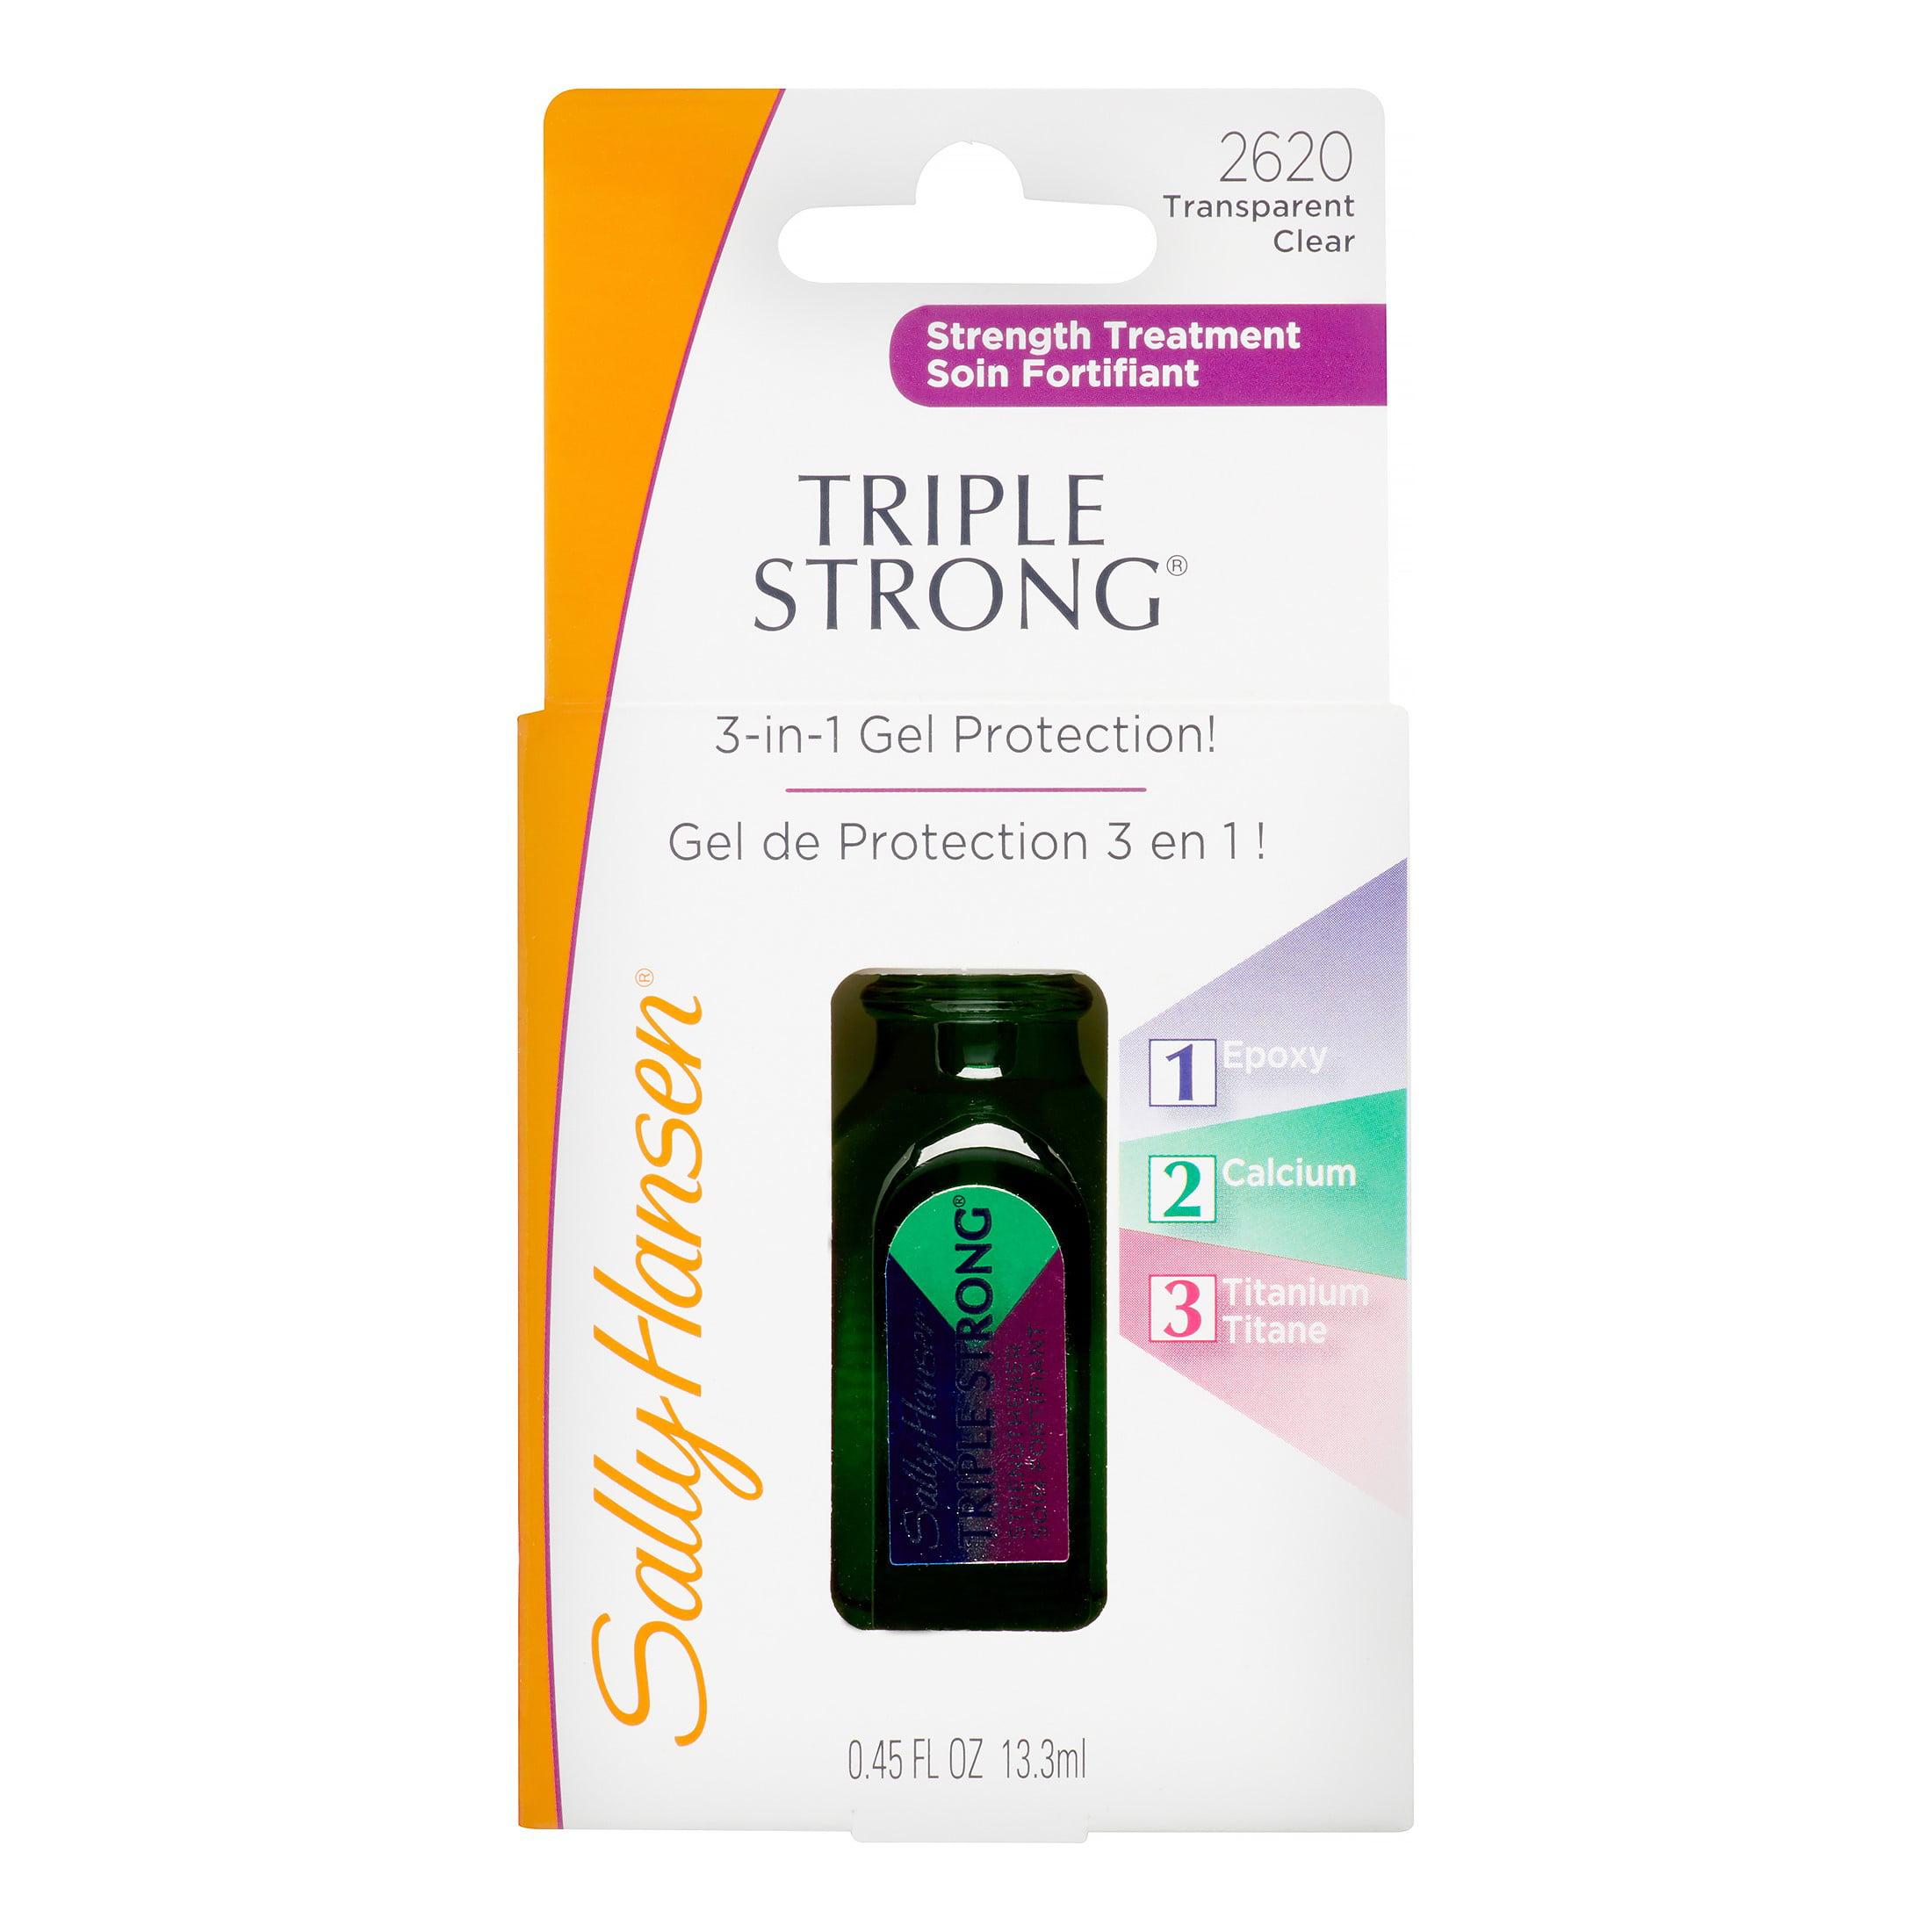 Coty Sally Hansen Triple Strong Strength Treatment, 0.45 oz